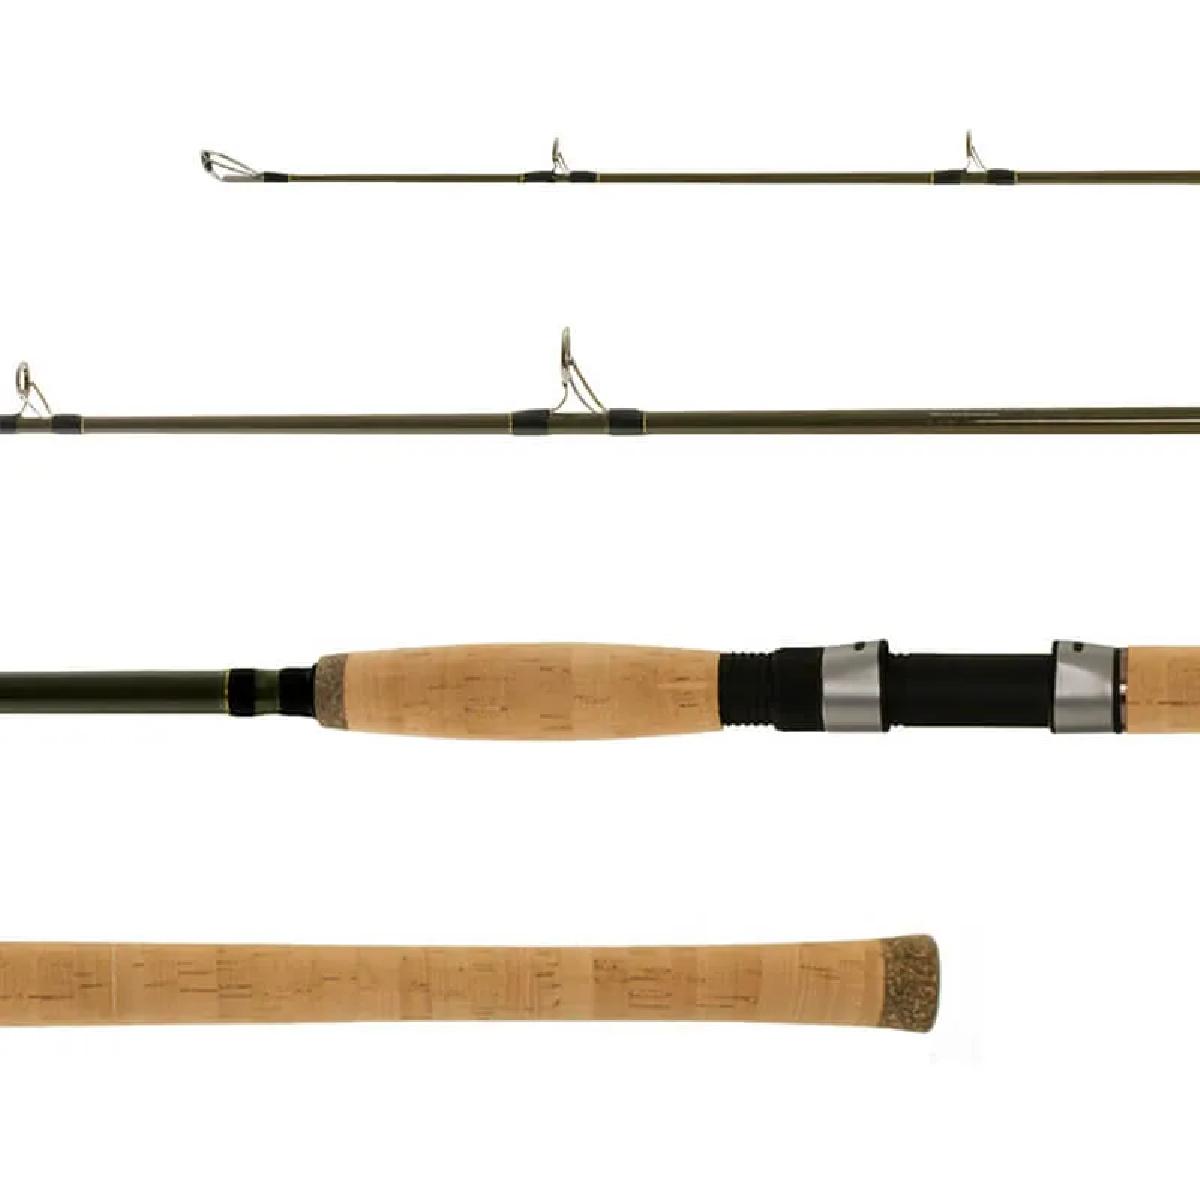 Vara Lumis Intense 631 (1,89m) 4-10Lb Para Molinete Inteiriça  - Pesca Adventure